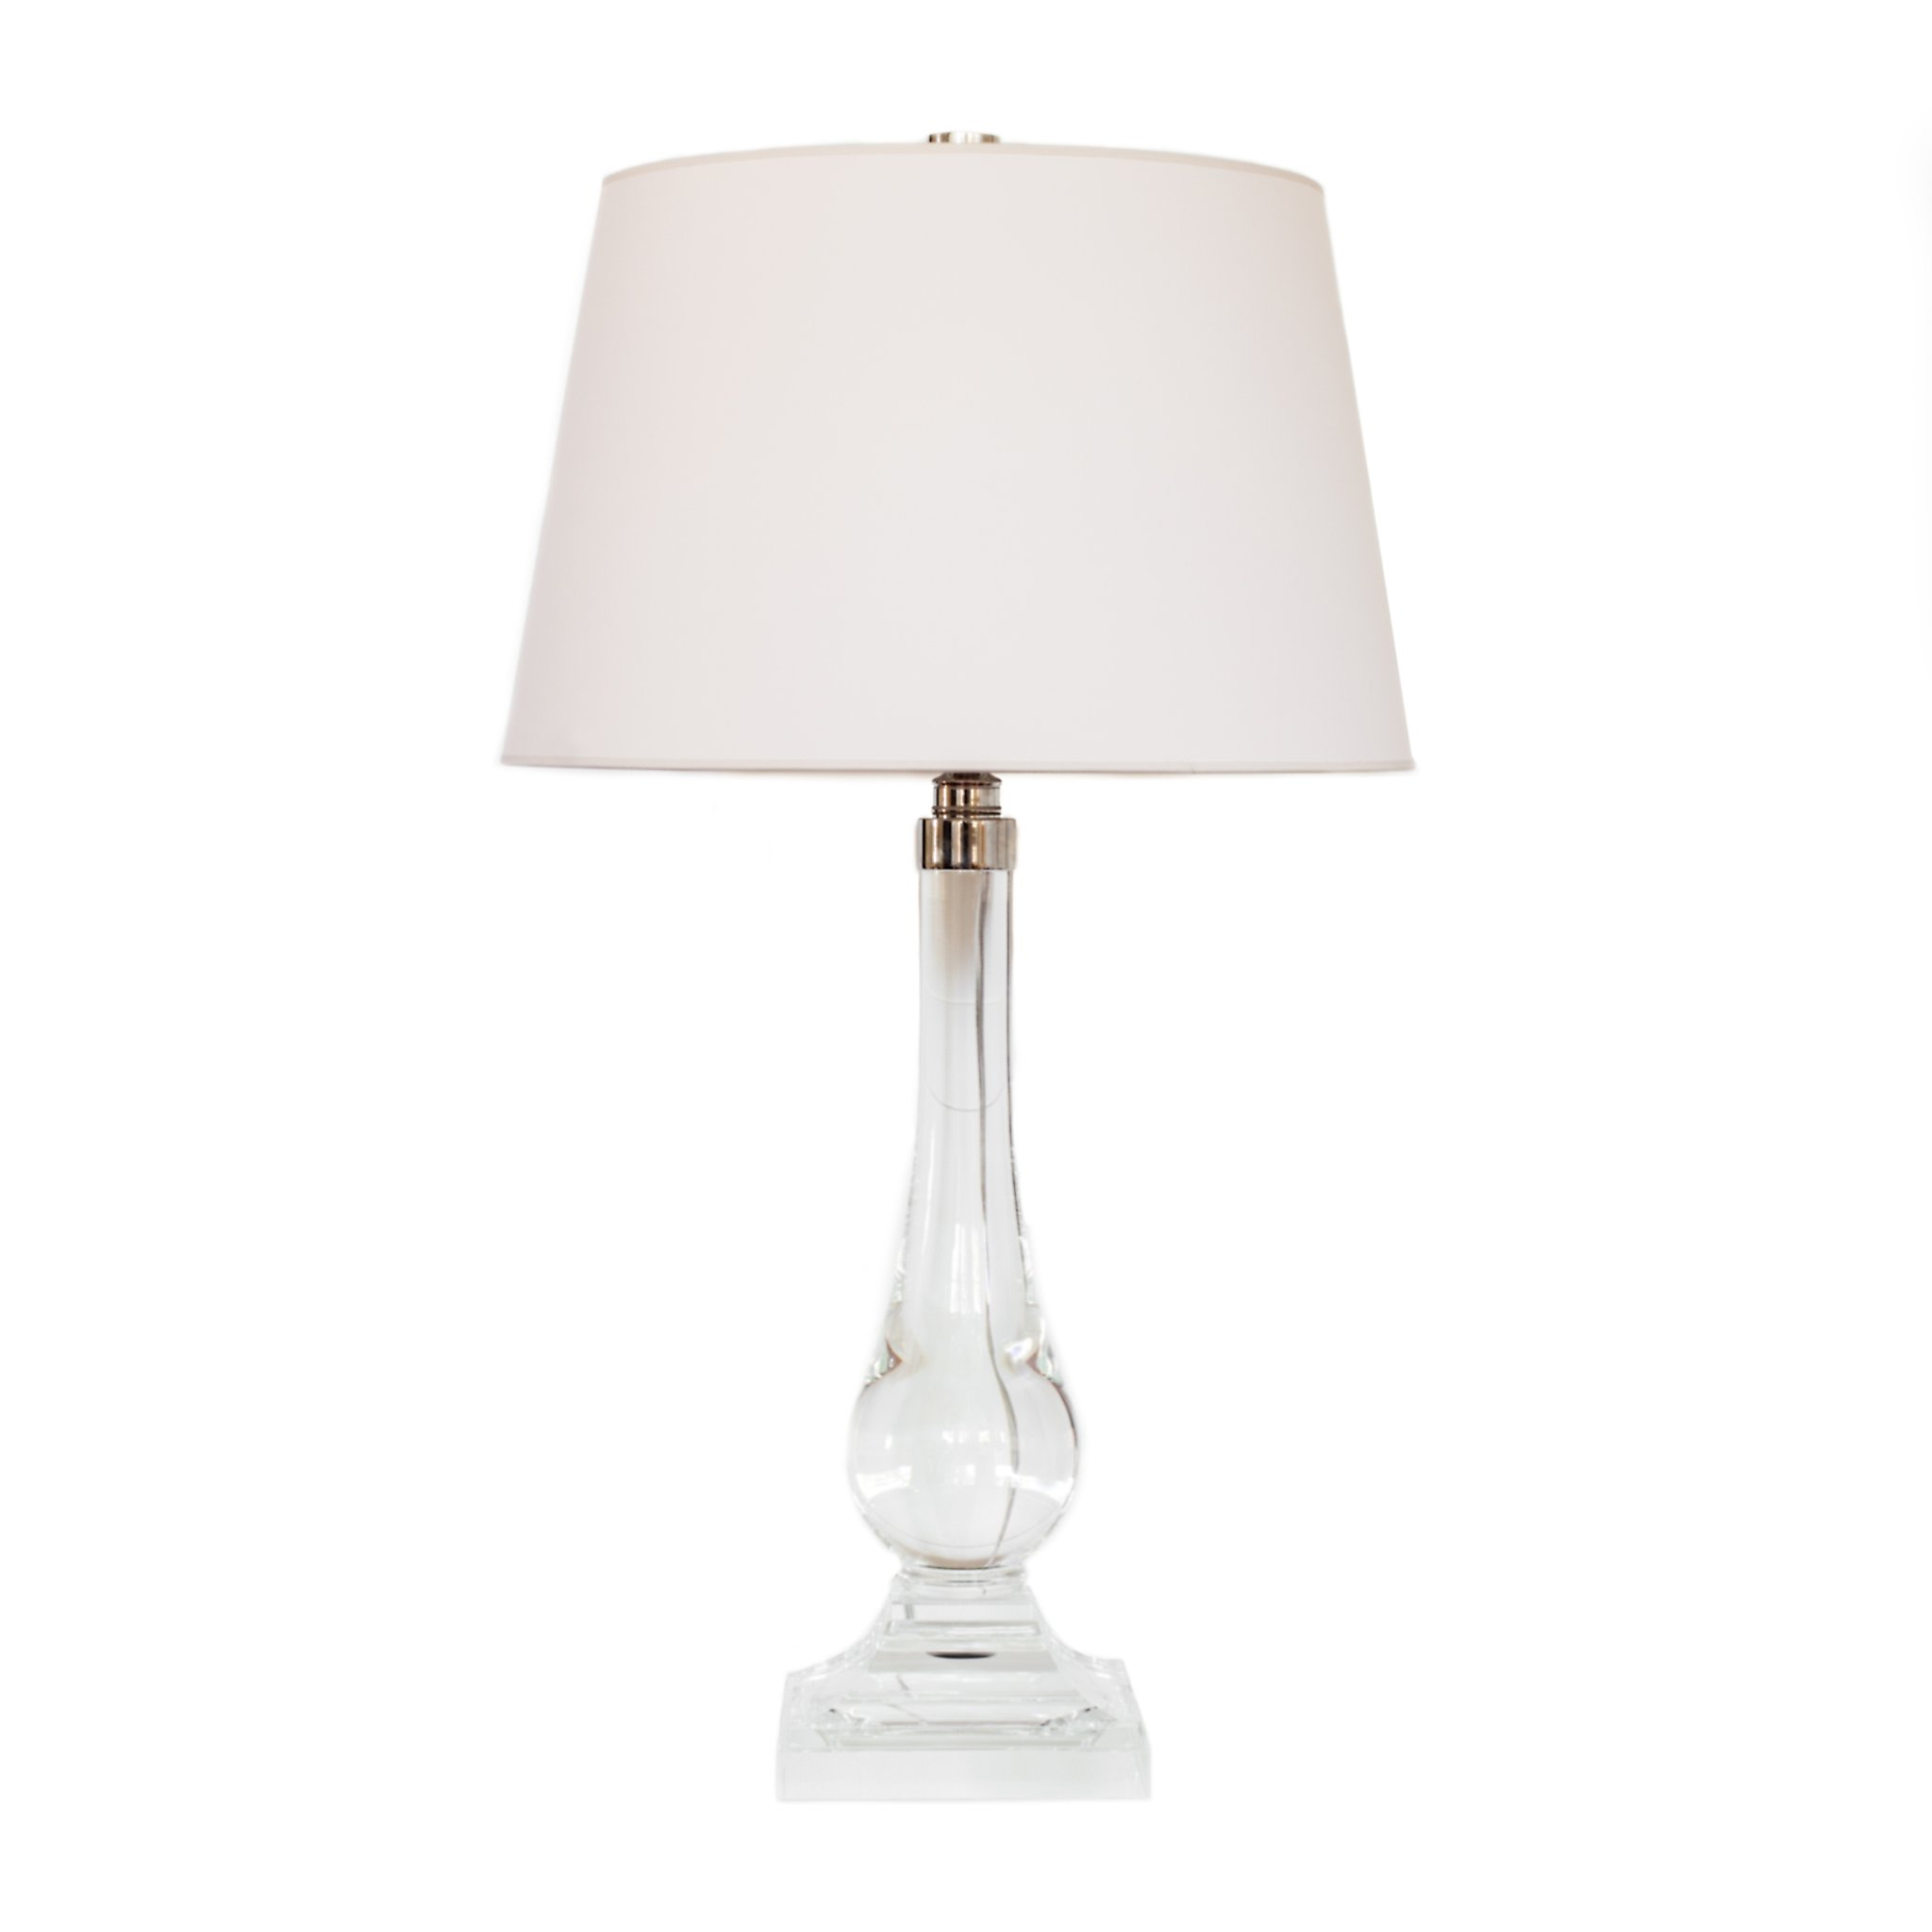 Modern Balastrade Lamp.jpg